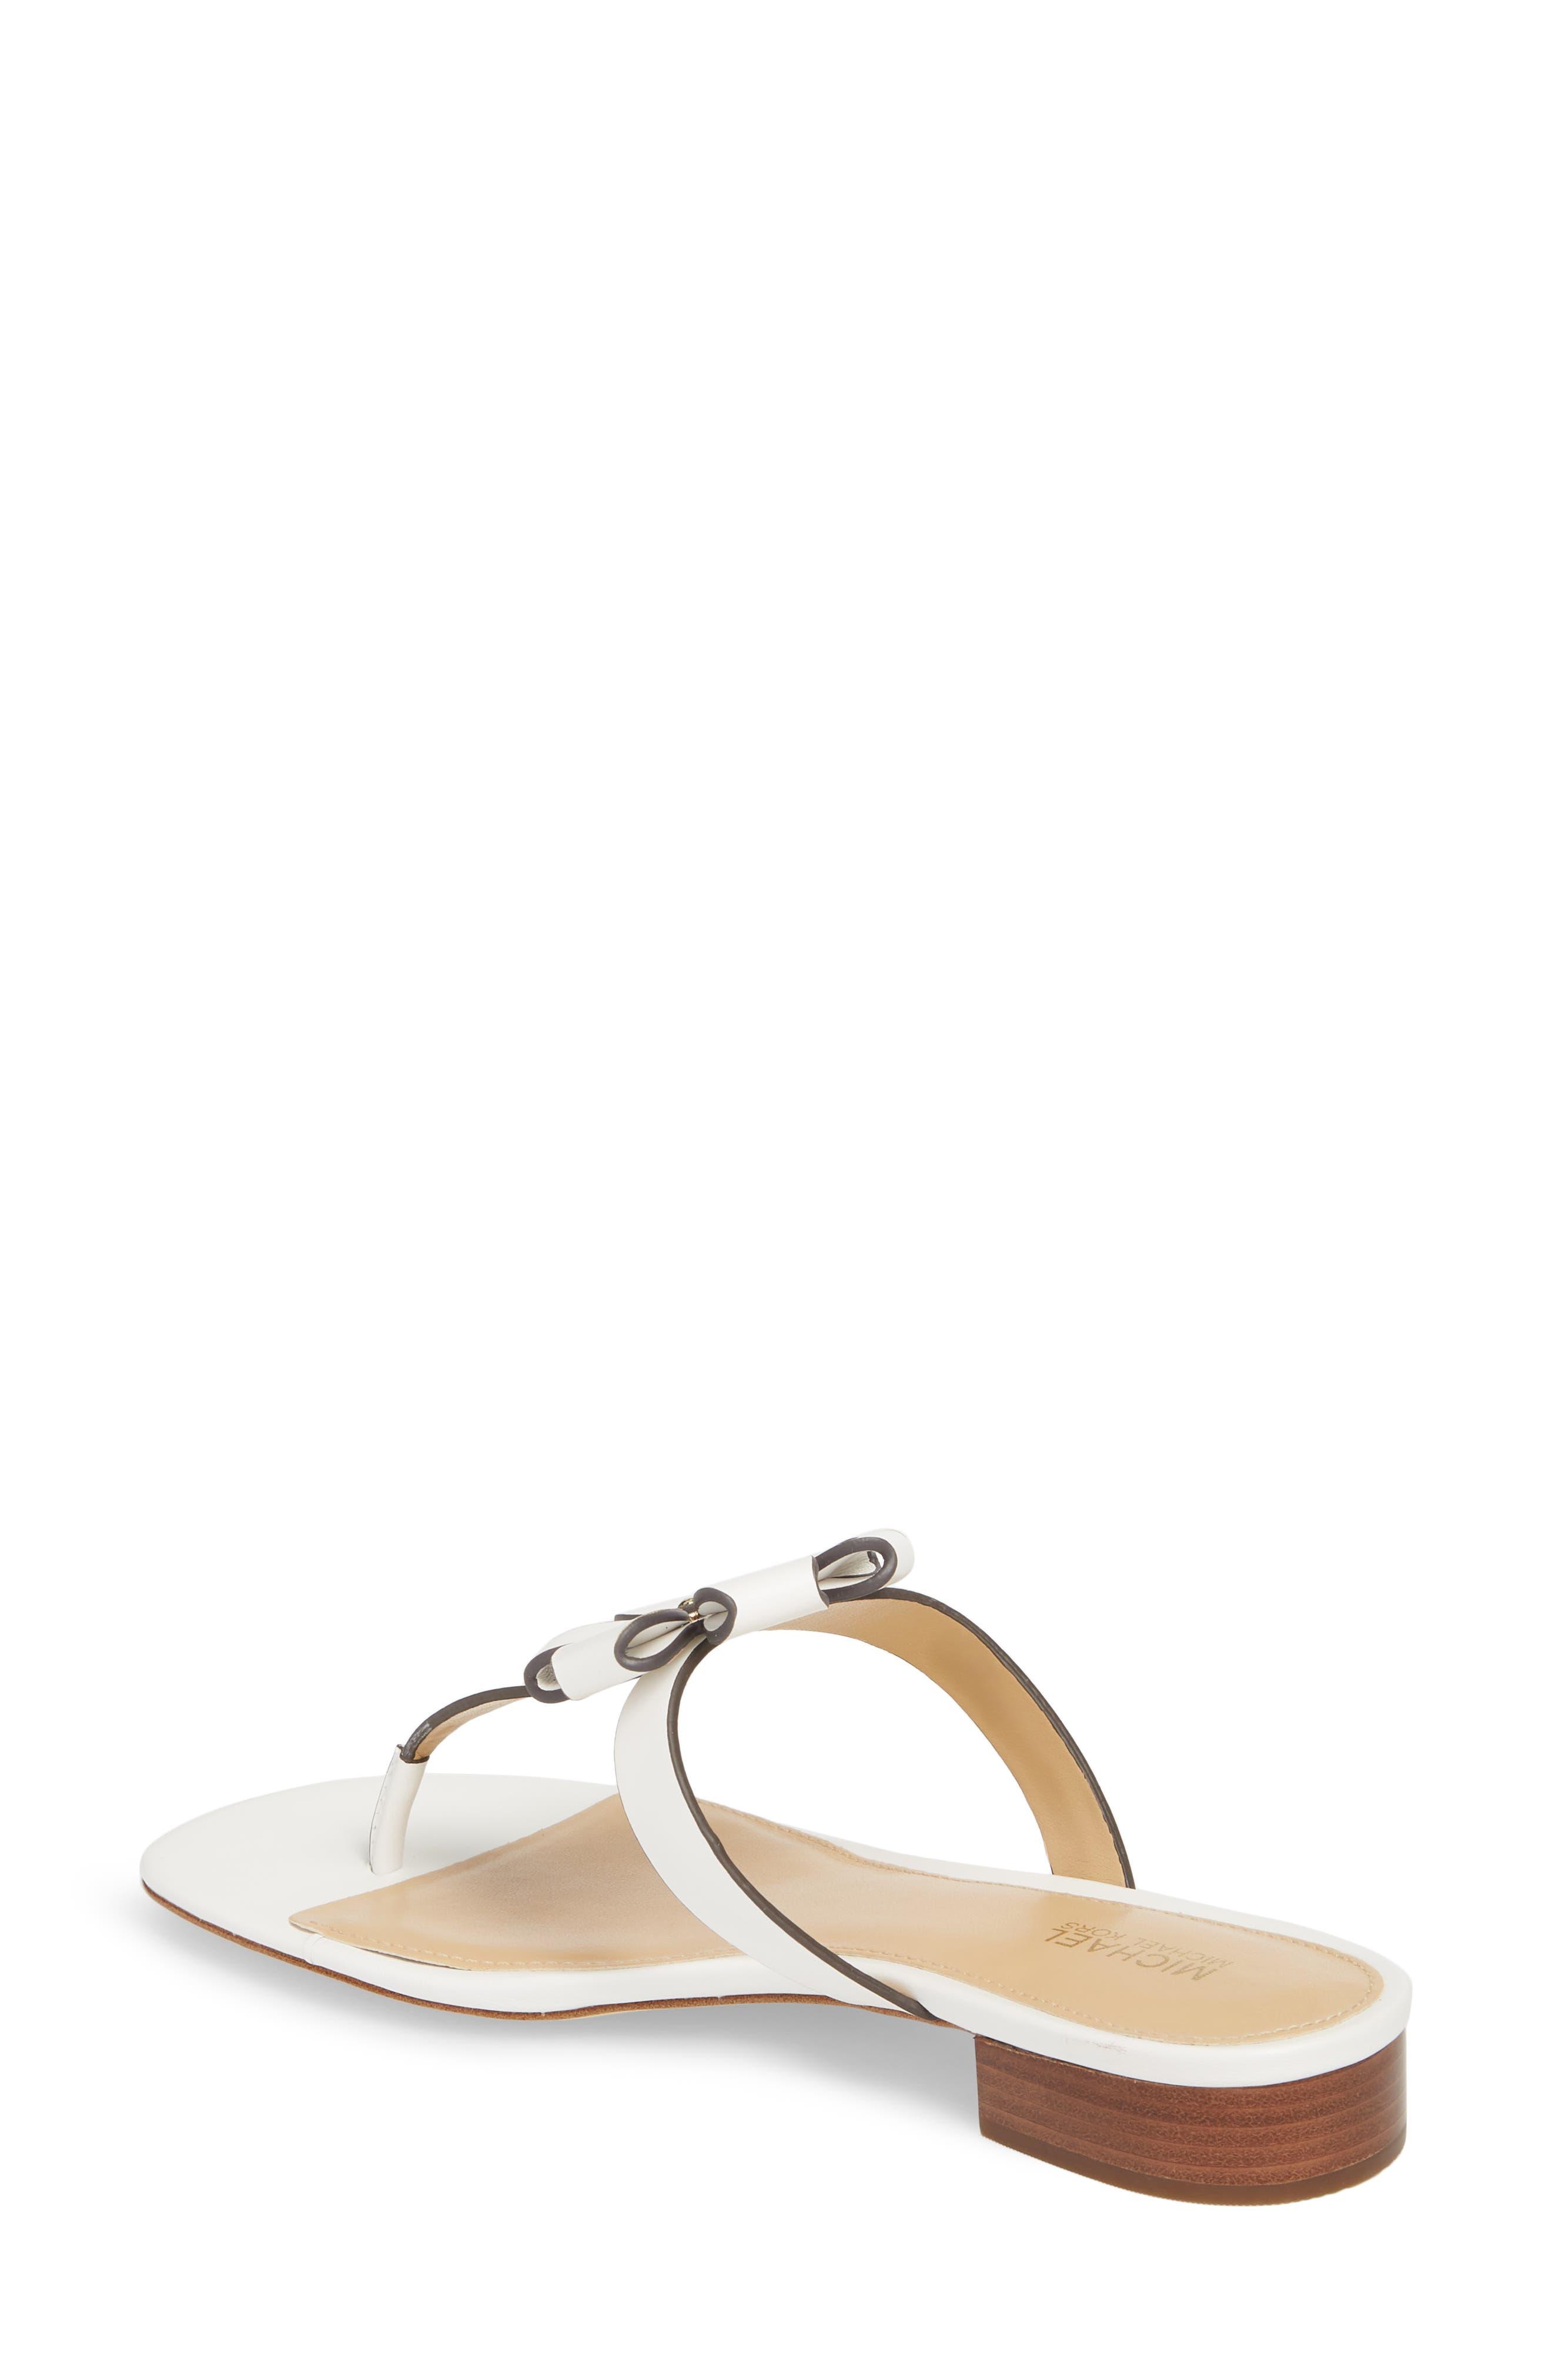 Tara Flip Flop,                             Alternate thumbnail 2, color,                             Optic White Leather